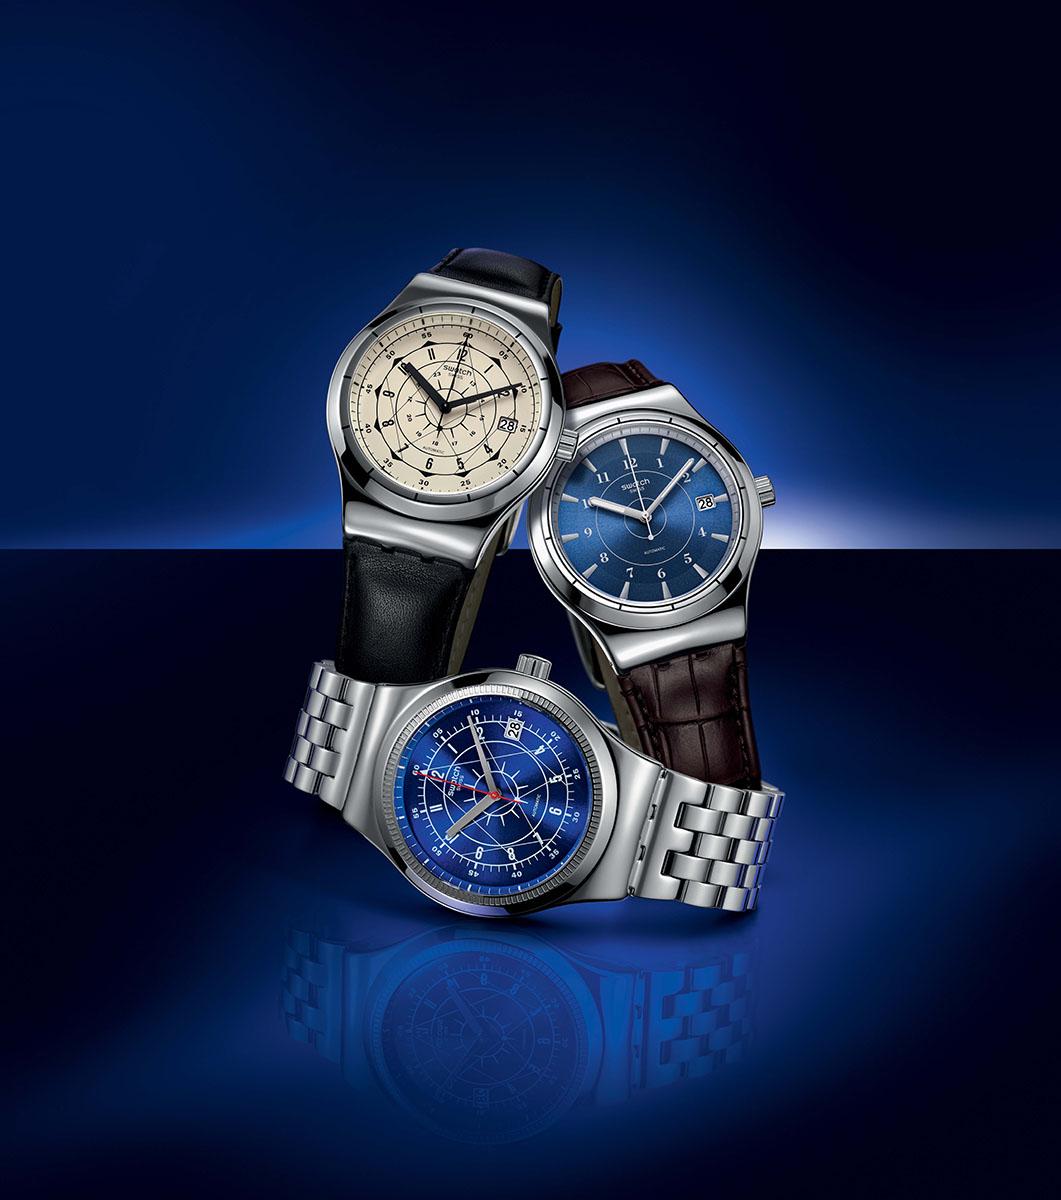 Packshot de la montre Swatch SISTEM51 IRONY